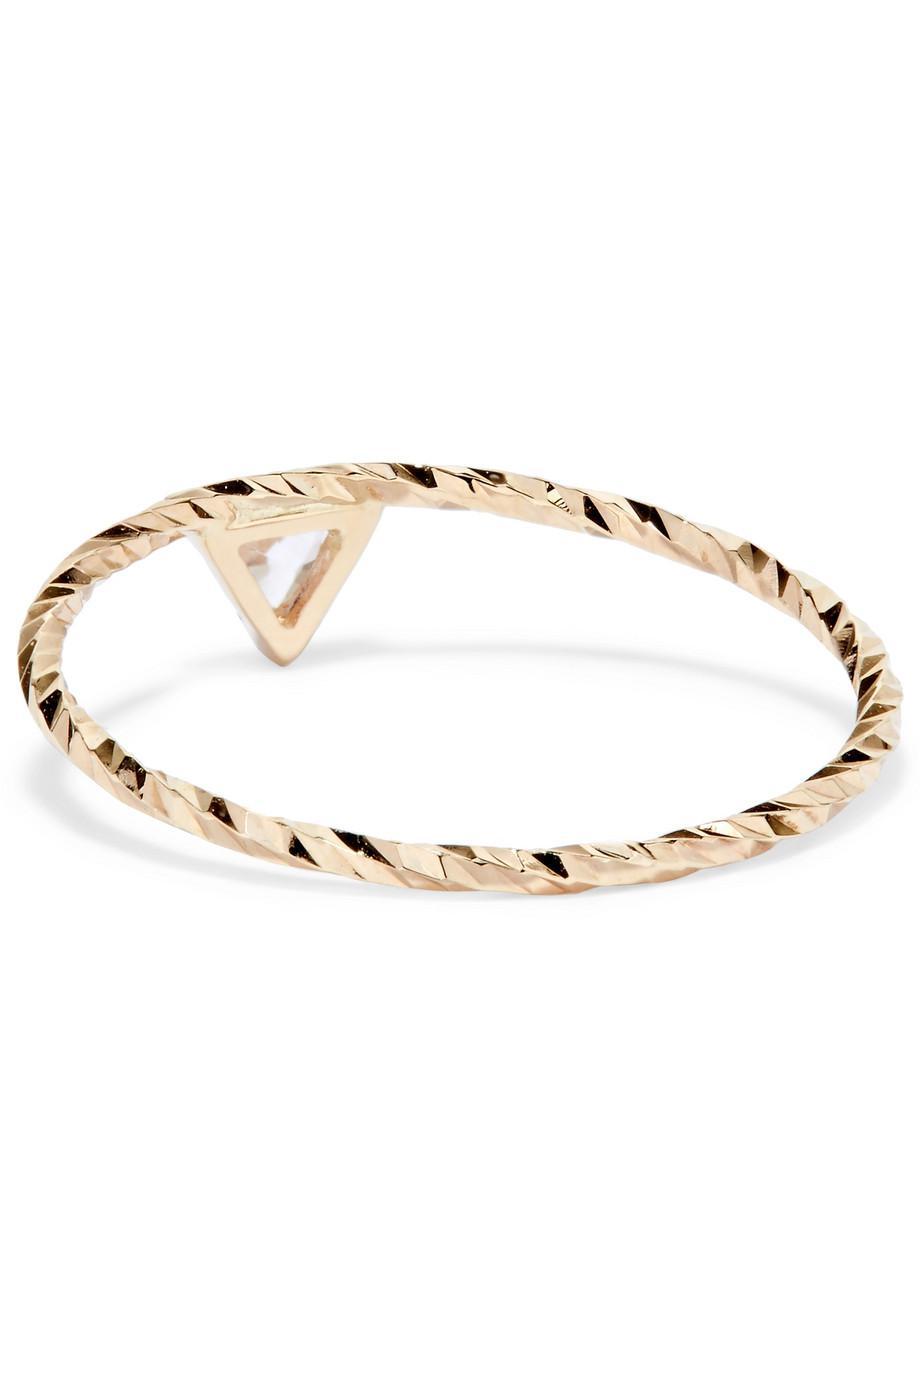 Maria Black Viper 14-karat Gold Sapphire Ring EcEJm